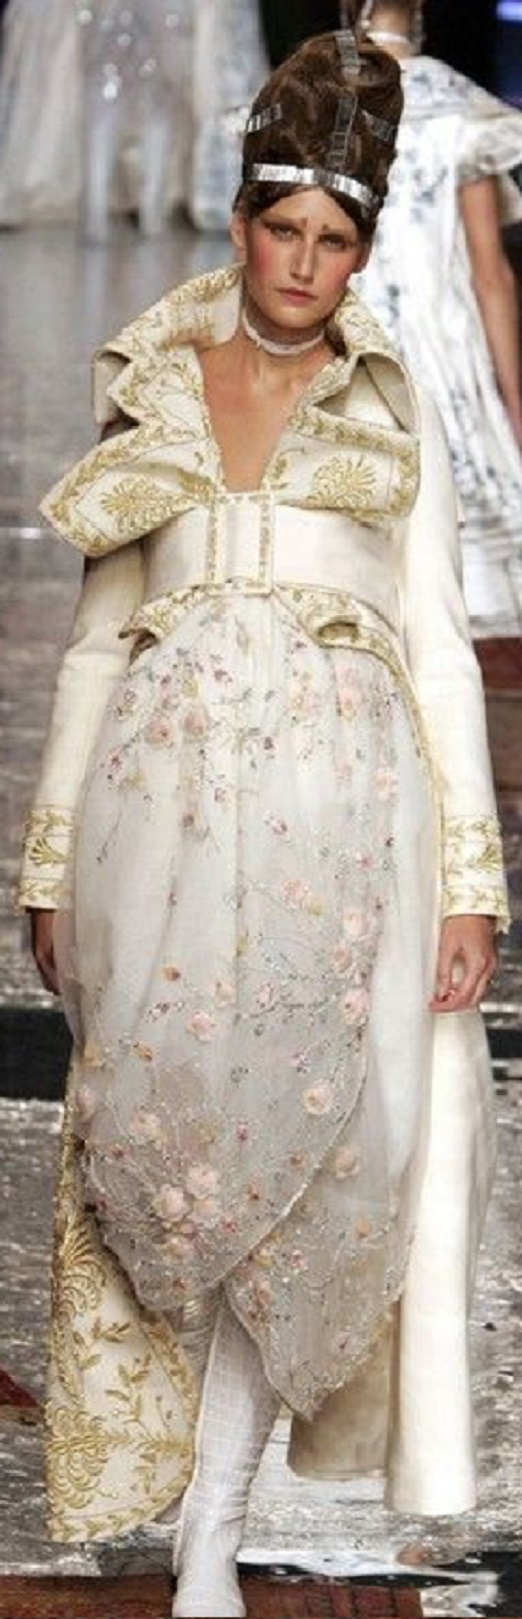 Dior Haute Couture spring - summer 2005 - John Galliano